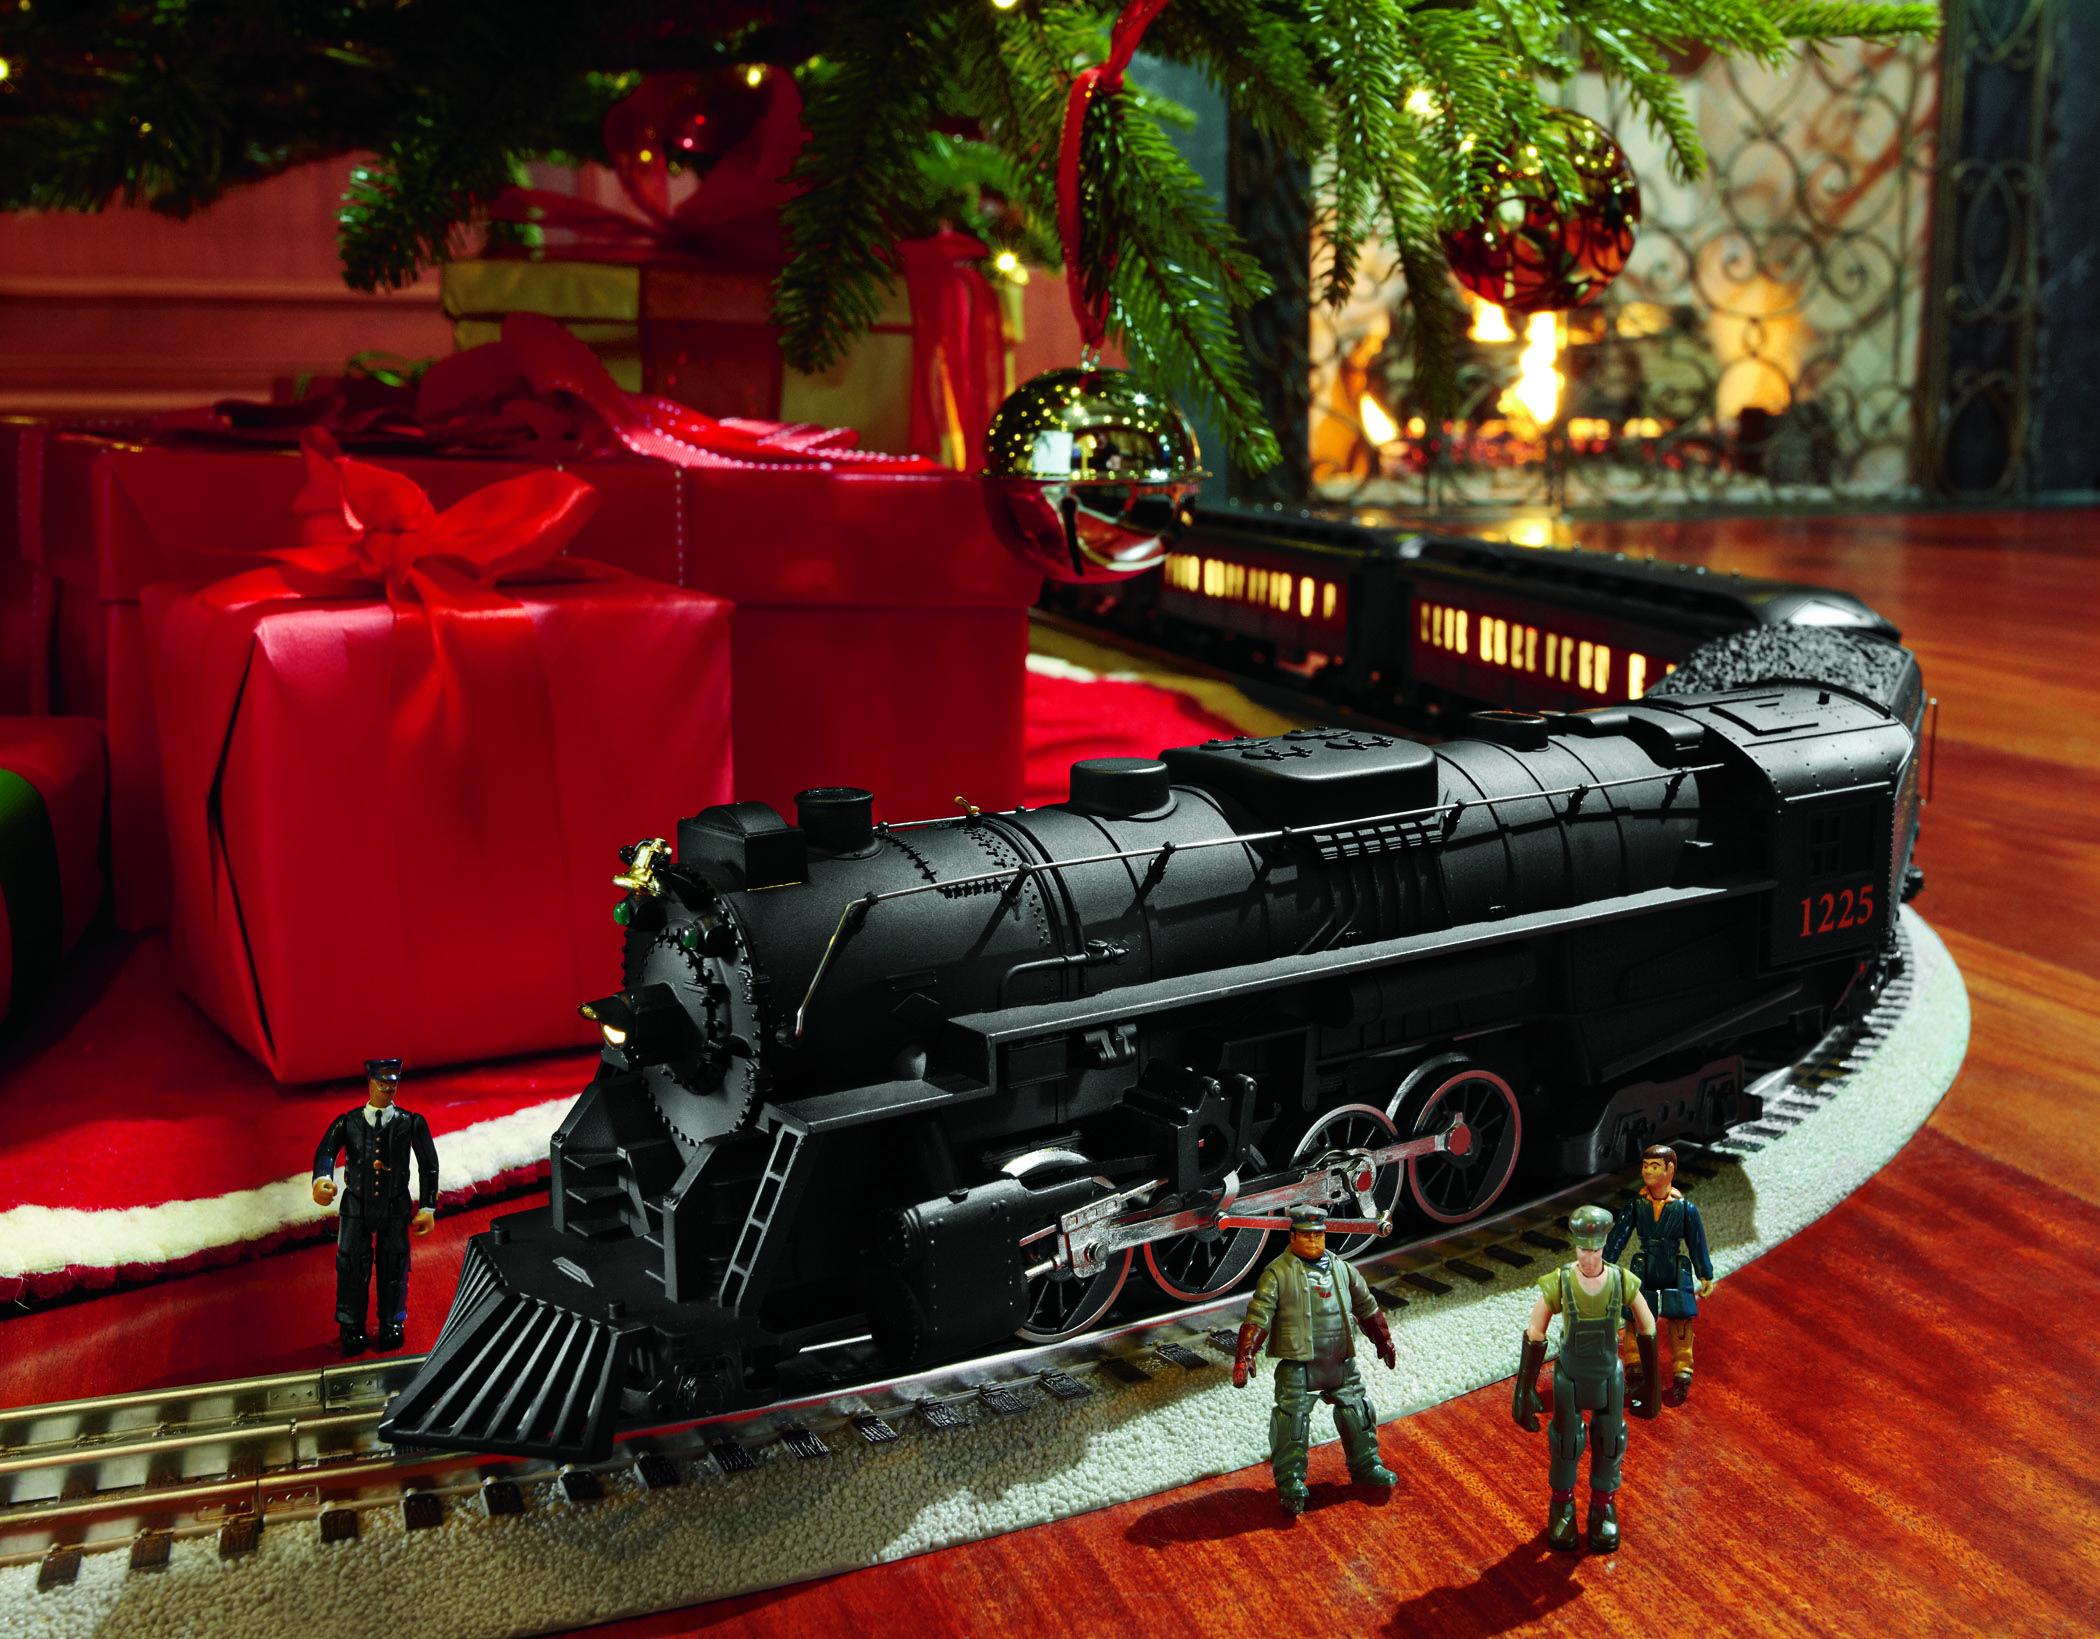 Lionel Trains Polar Express O Gauge Model Trains Toy Train Lionel Trains